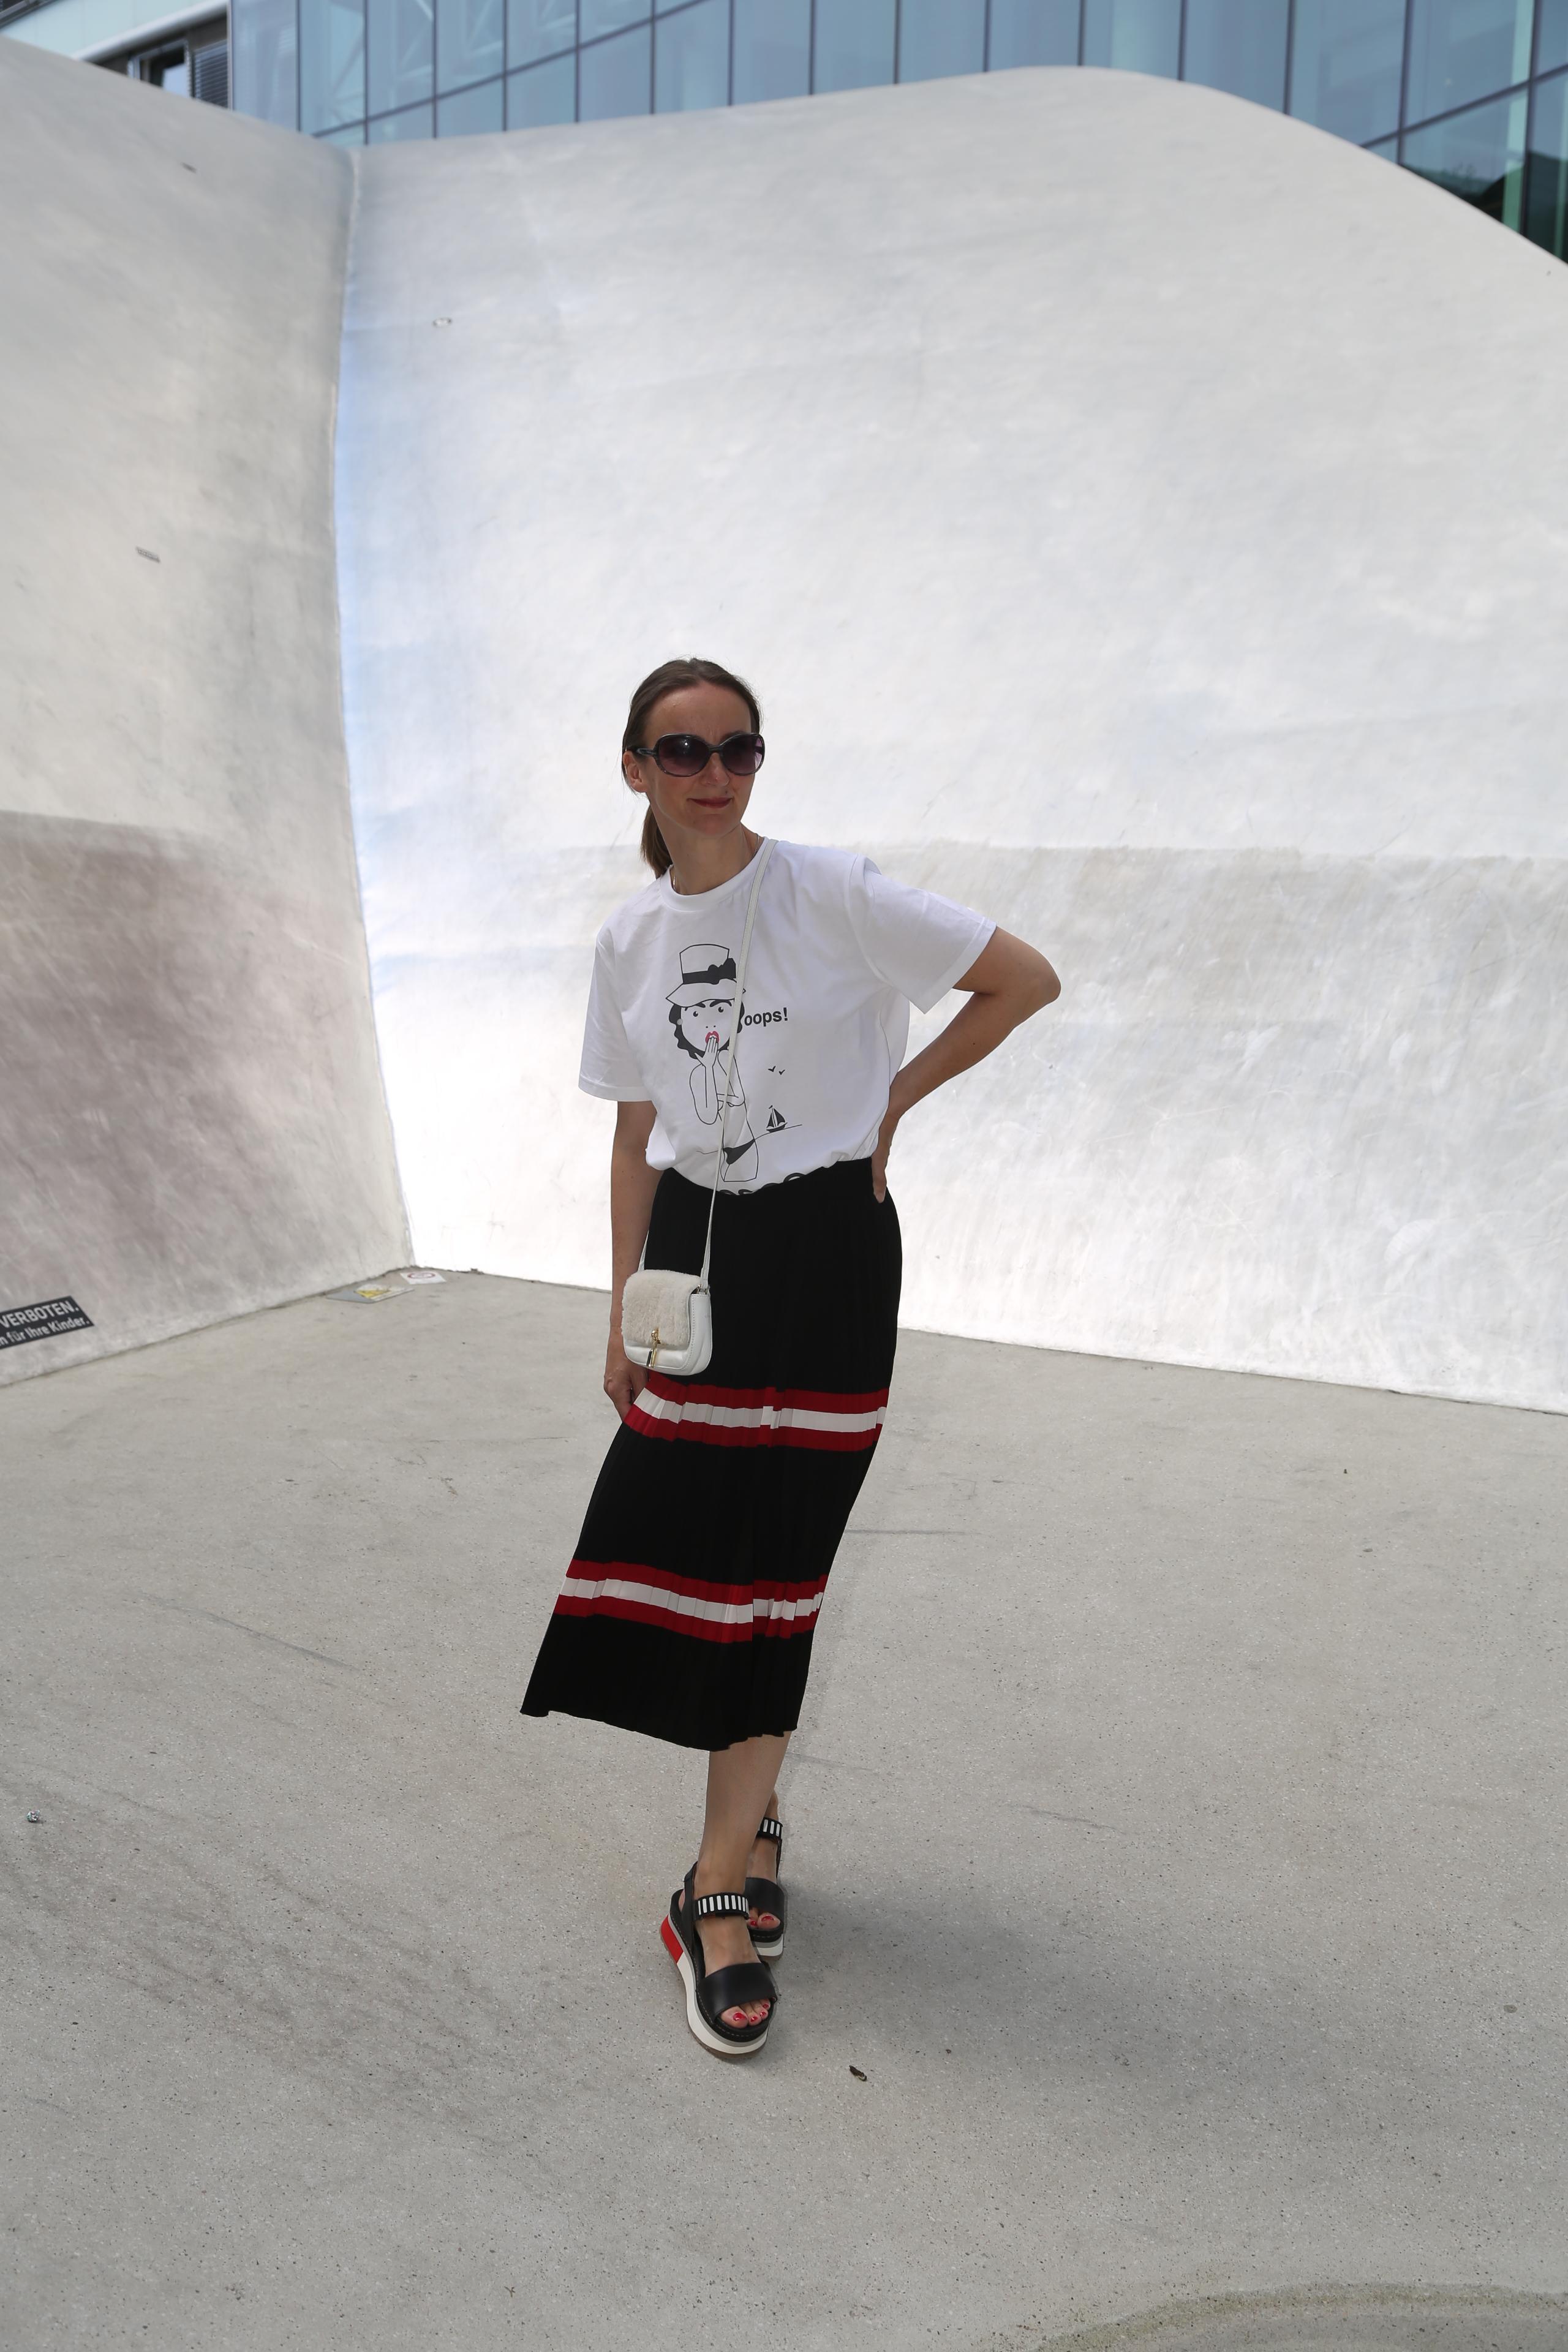 sandale-rot_oceanblue-style_faltenrock_sandalen_prada_art-shoes_t-shirt_chanel_tasche-klein_plateau-sandalen_mode-blog-ü40 (2)